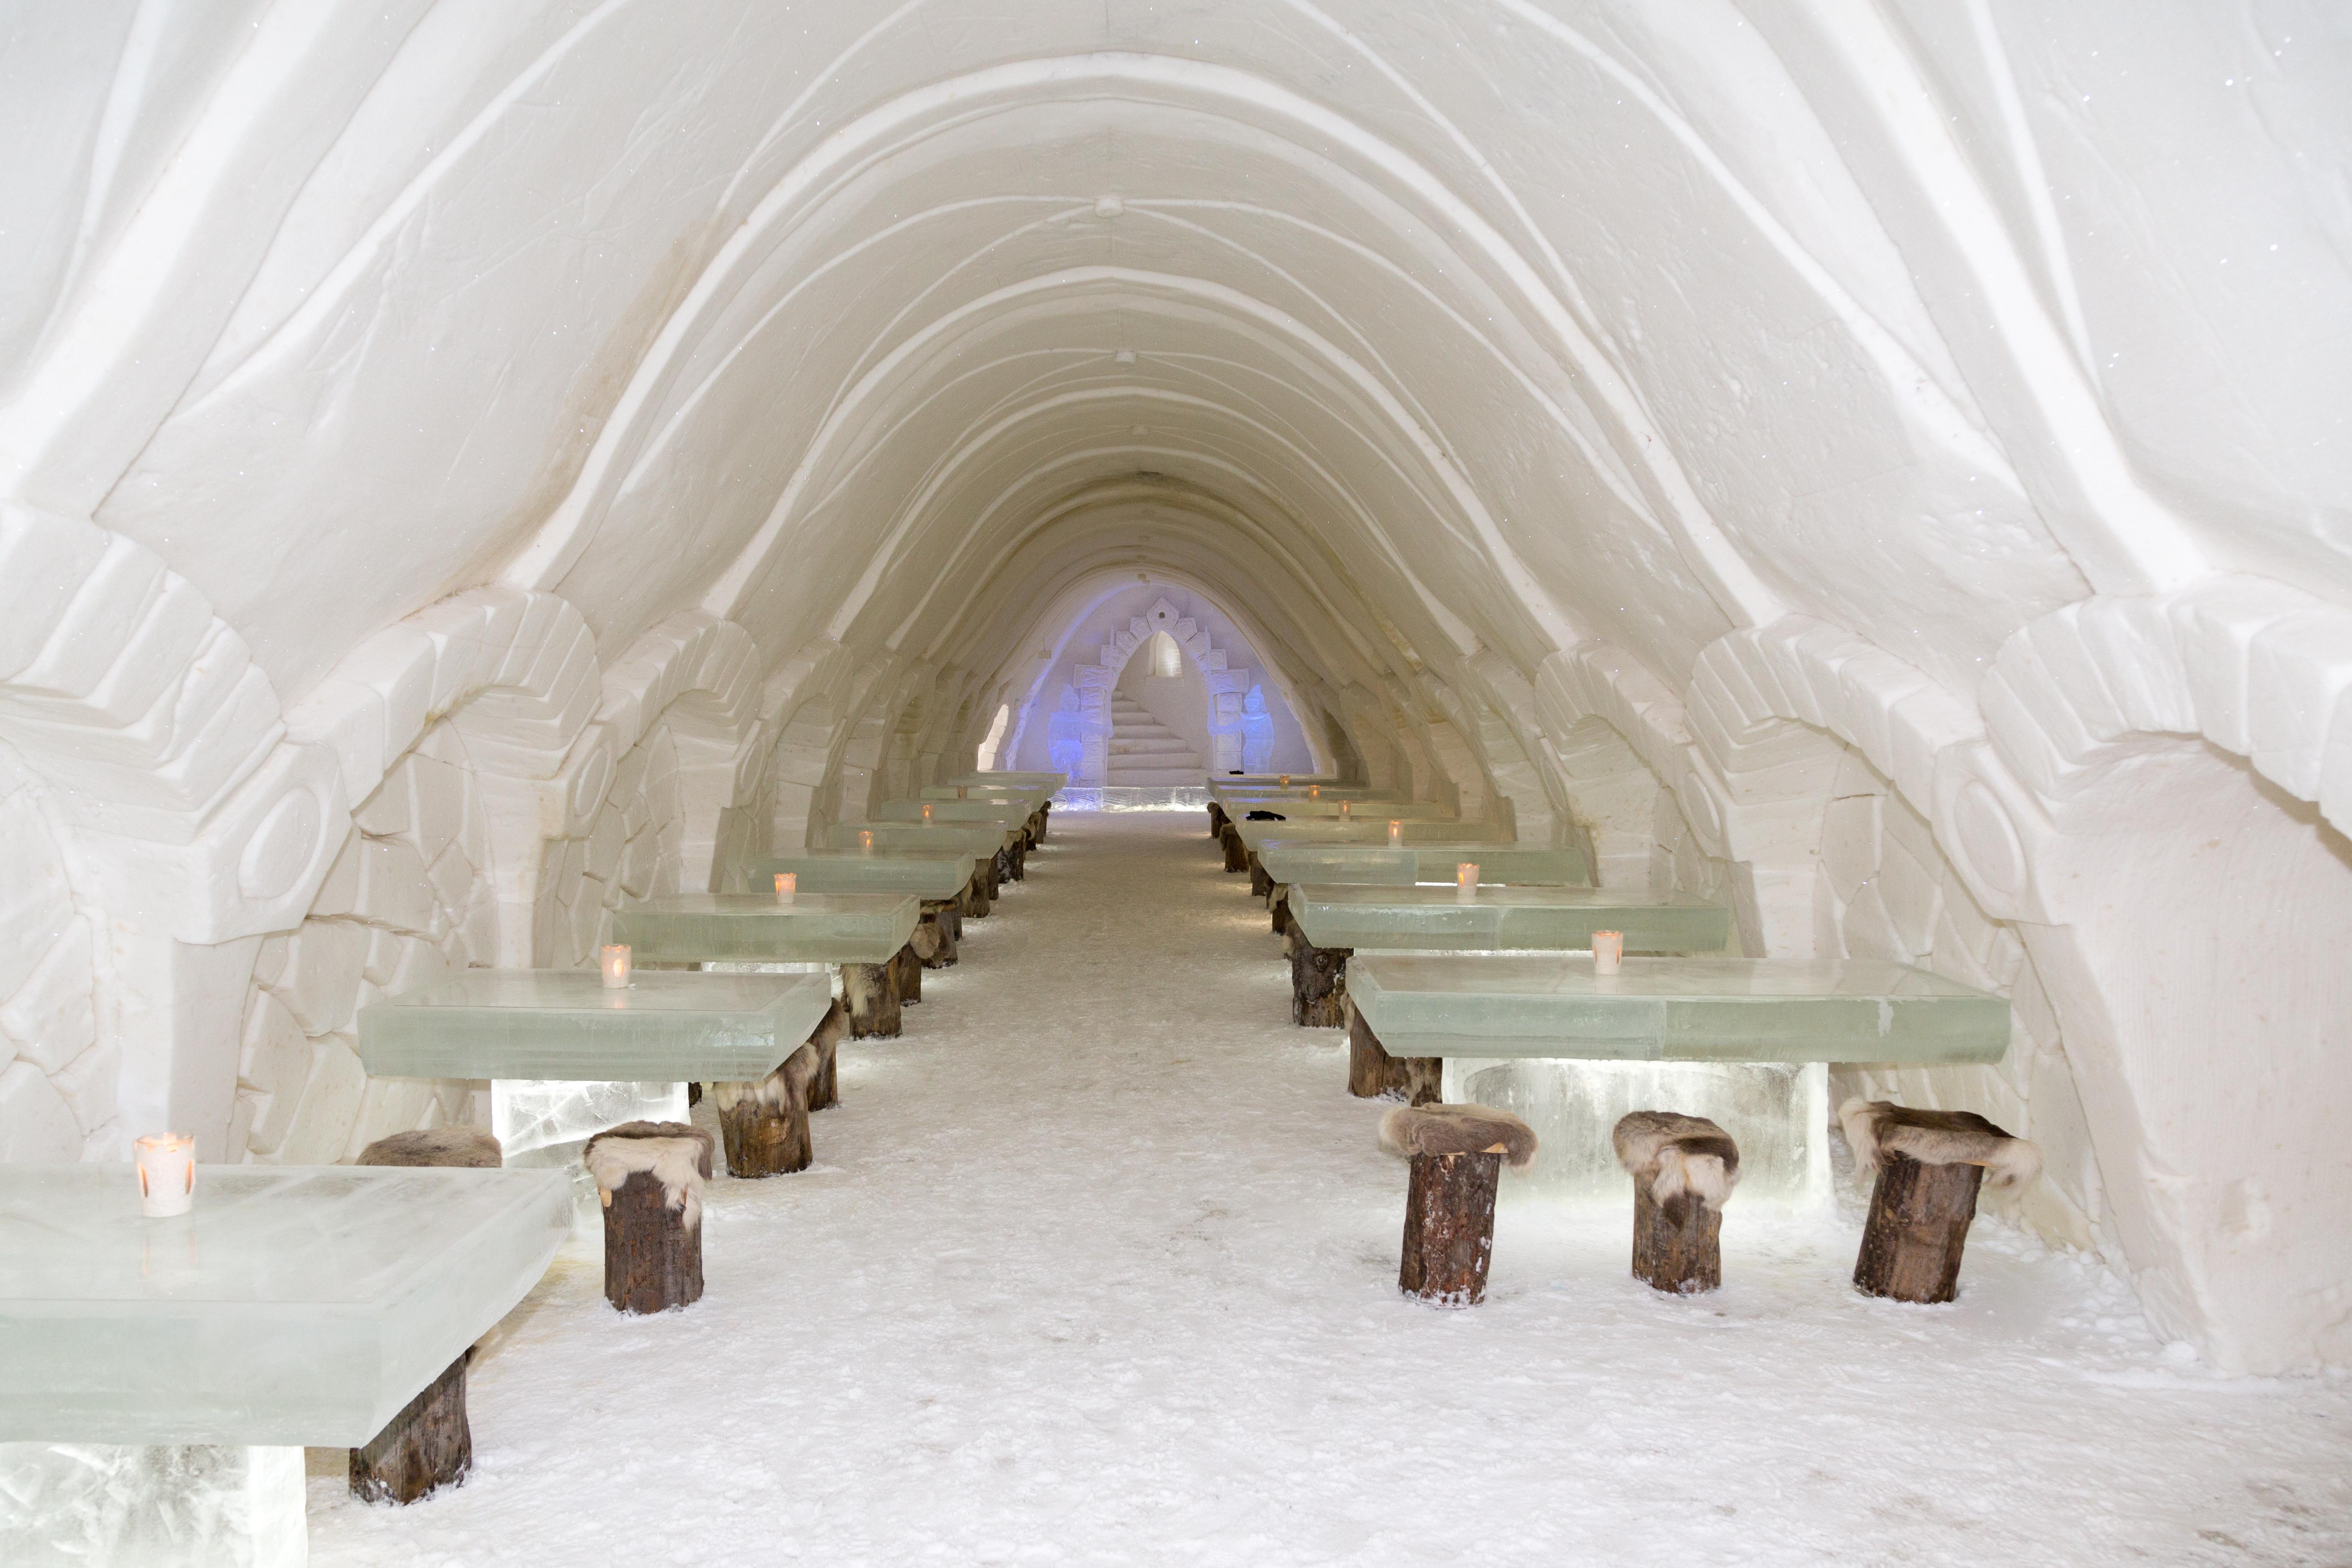 Snow Castle, Kemi, Finland